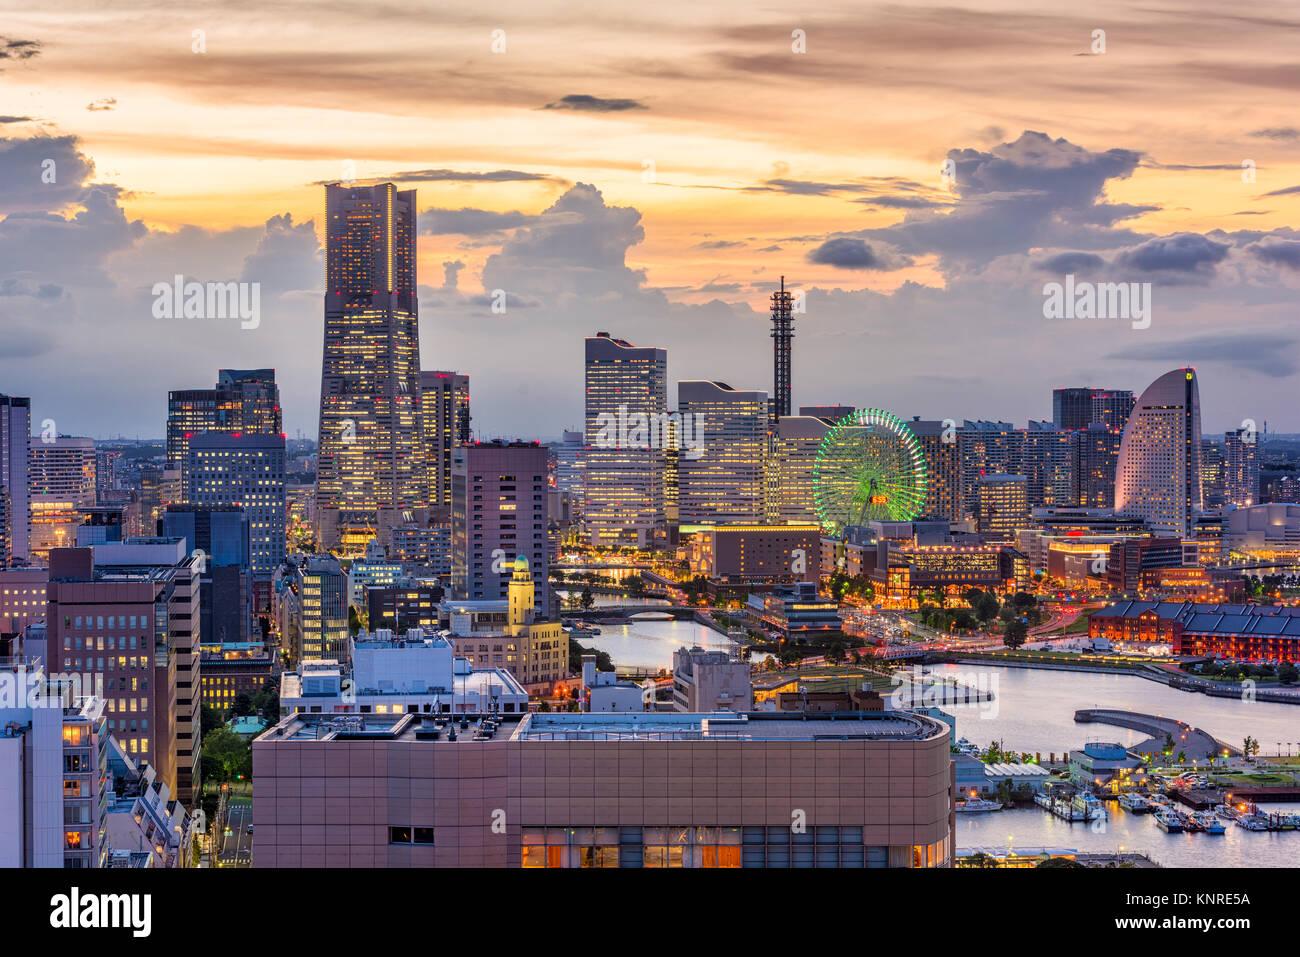 Yokohama, Kanagawa, Japan cityscape of Minato Mirai District. - Stock Image